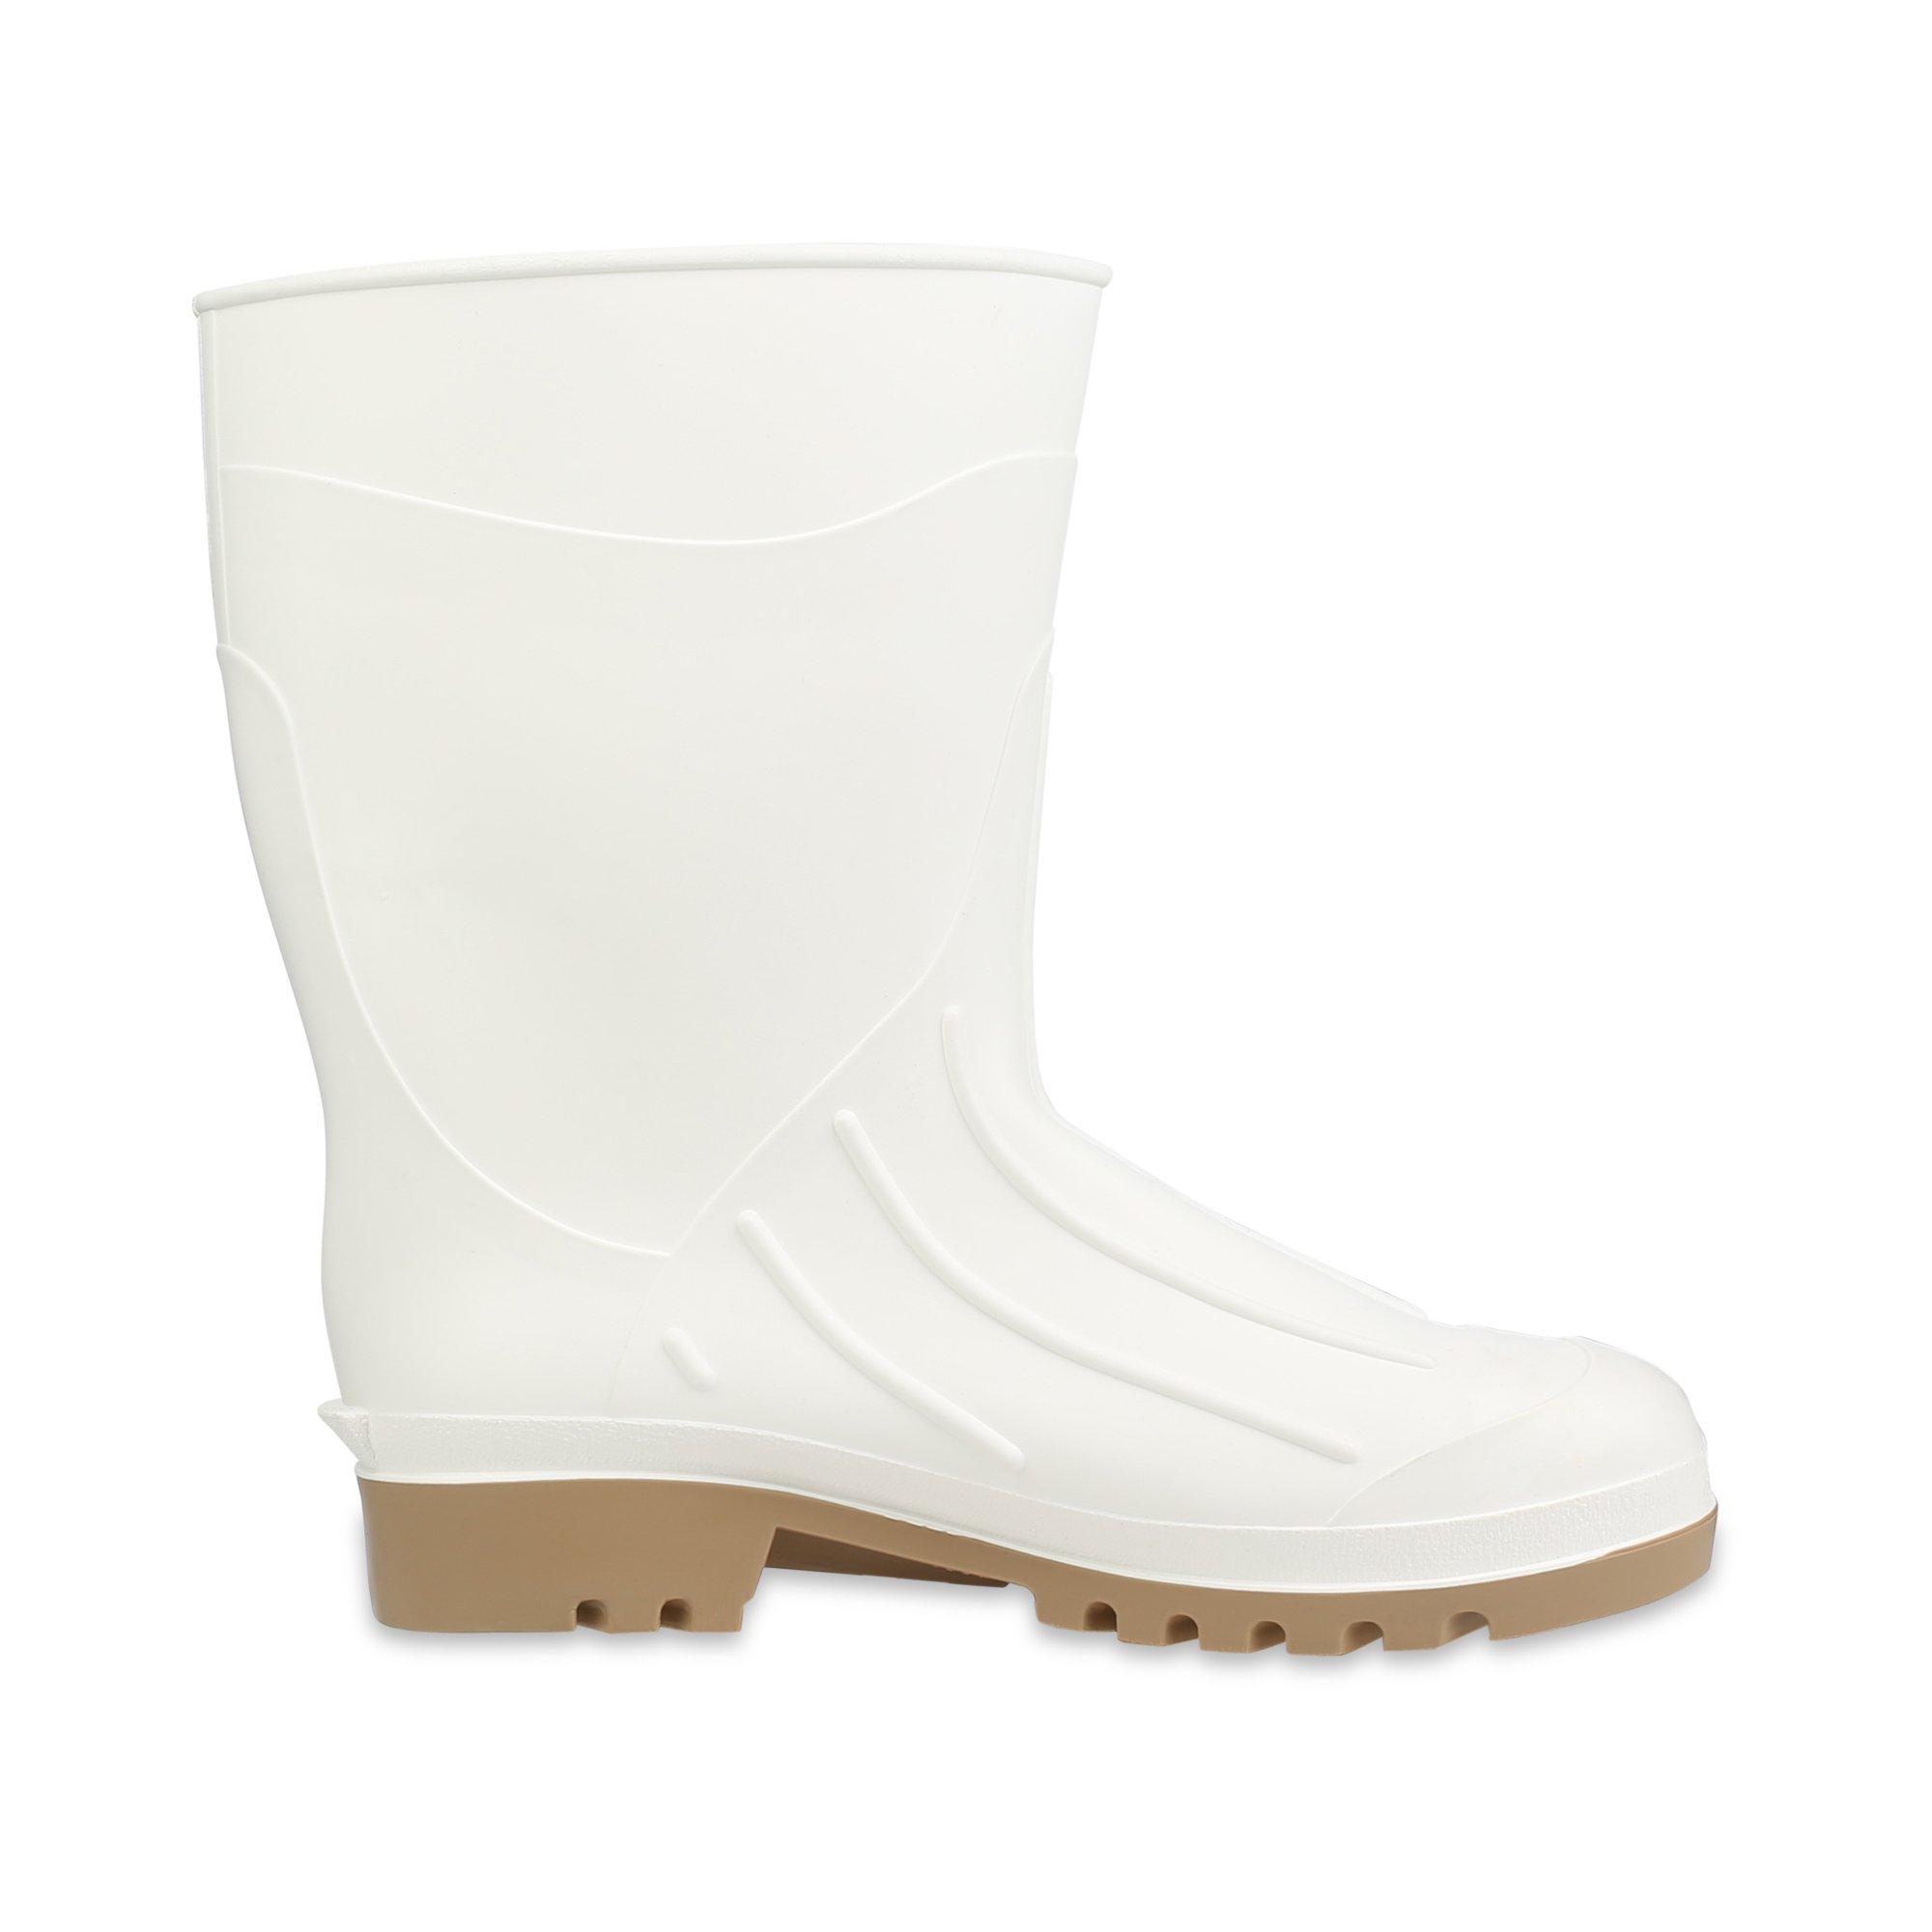 Servus 12'' PVC Polyblend Soft Toe Shrimp Boots, White (74928) by Honeywell (Image #6)